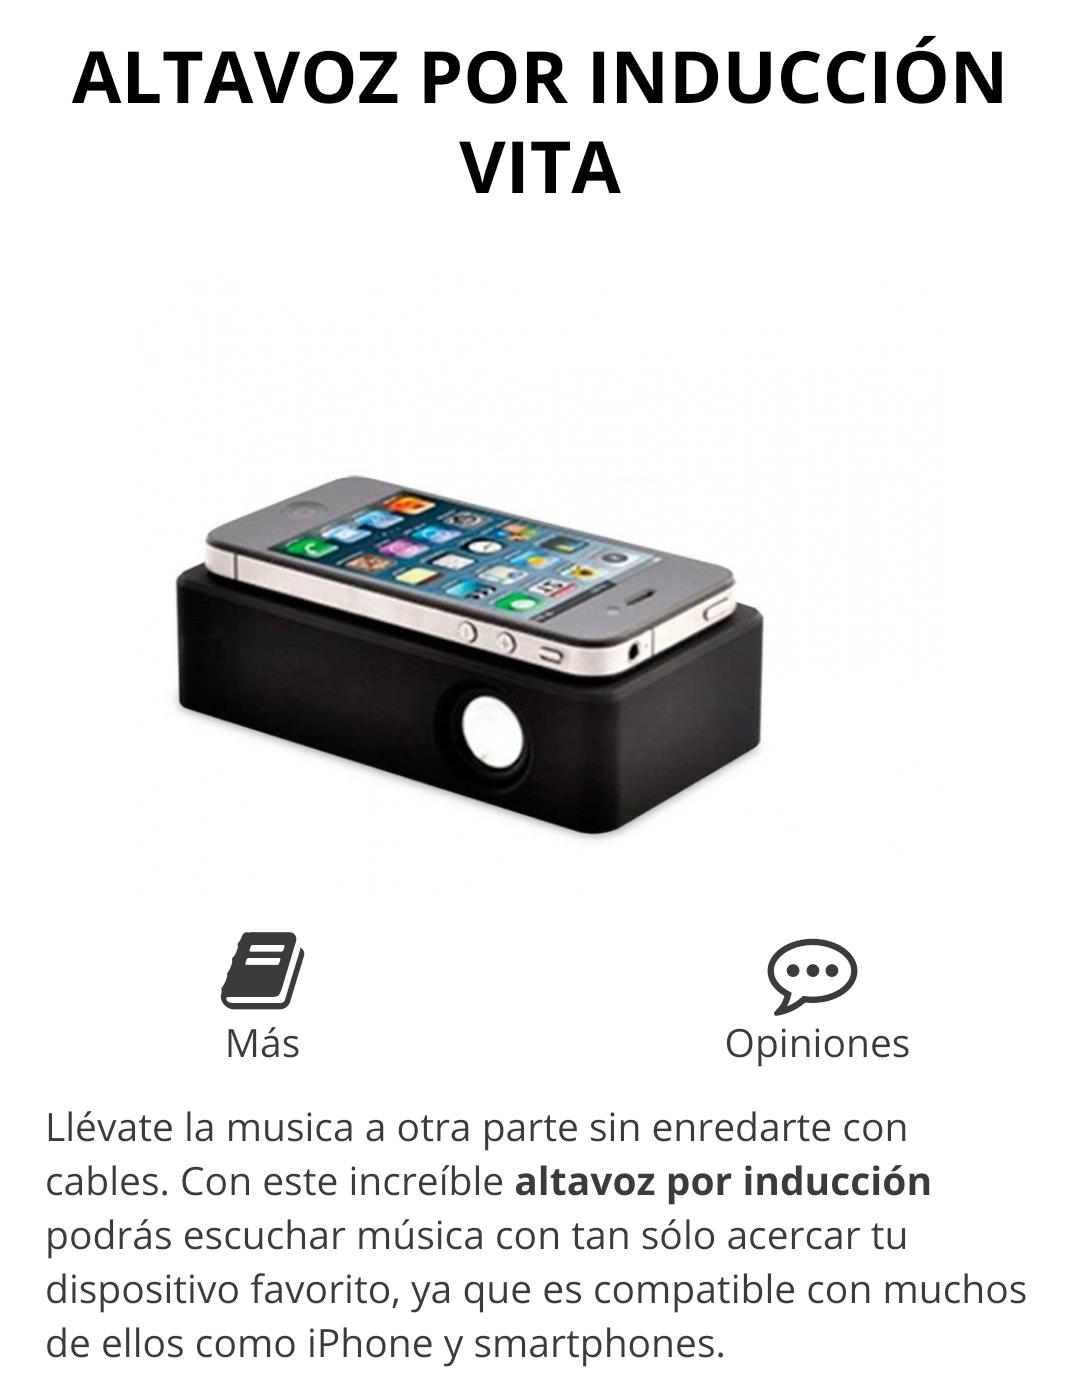 Altavoz por Inducción Vita. Escucha tu música solo acercando tú dispositivo, sin cables ni bluetooth